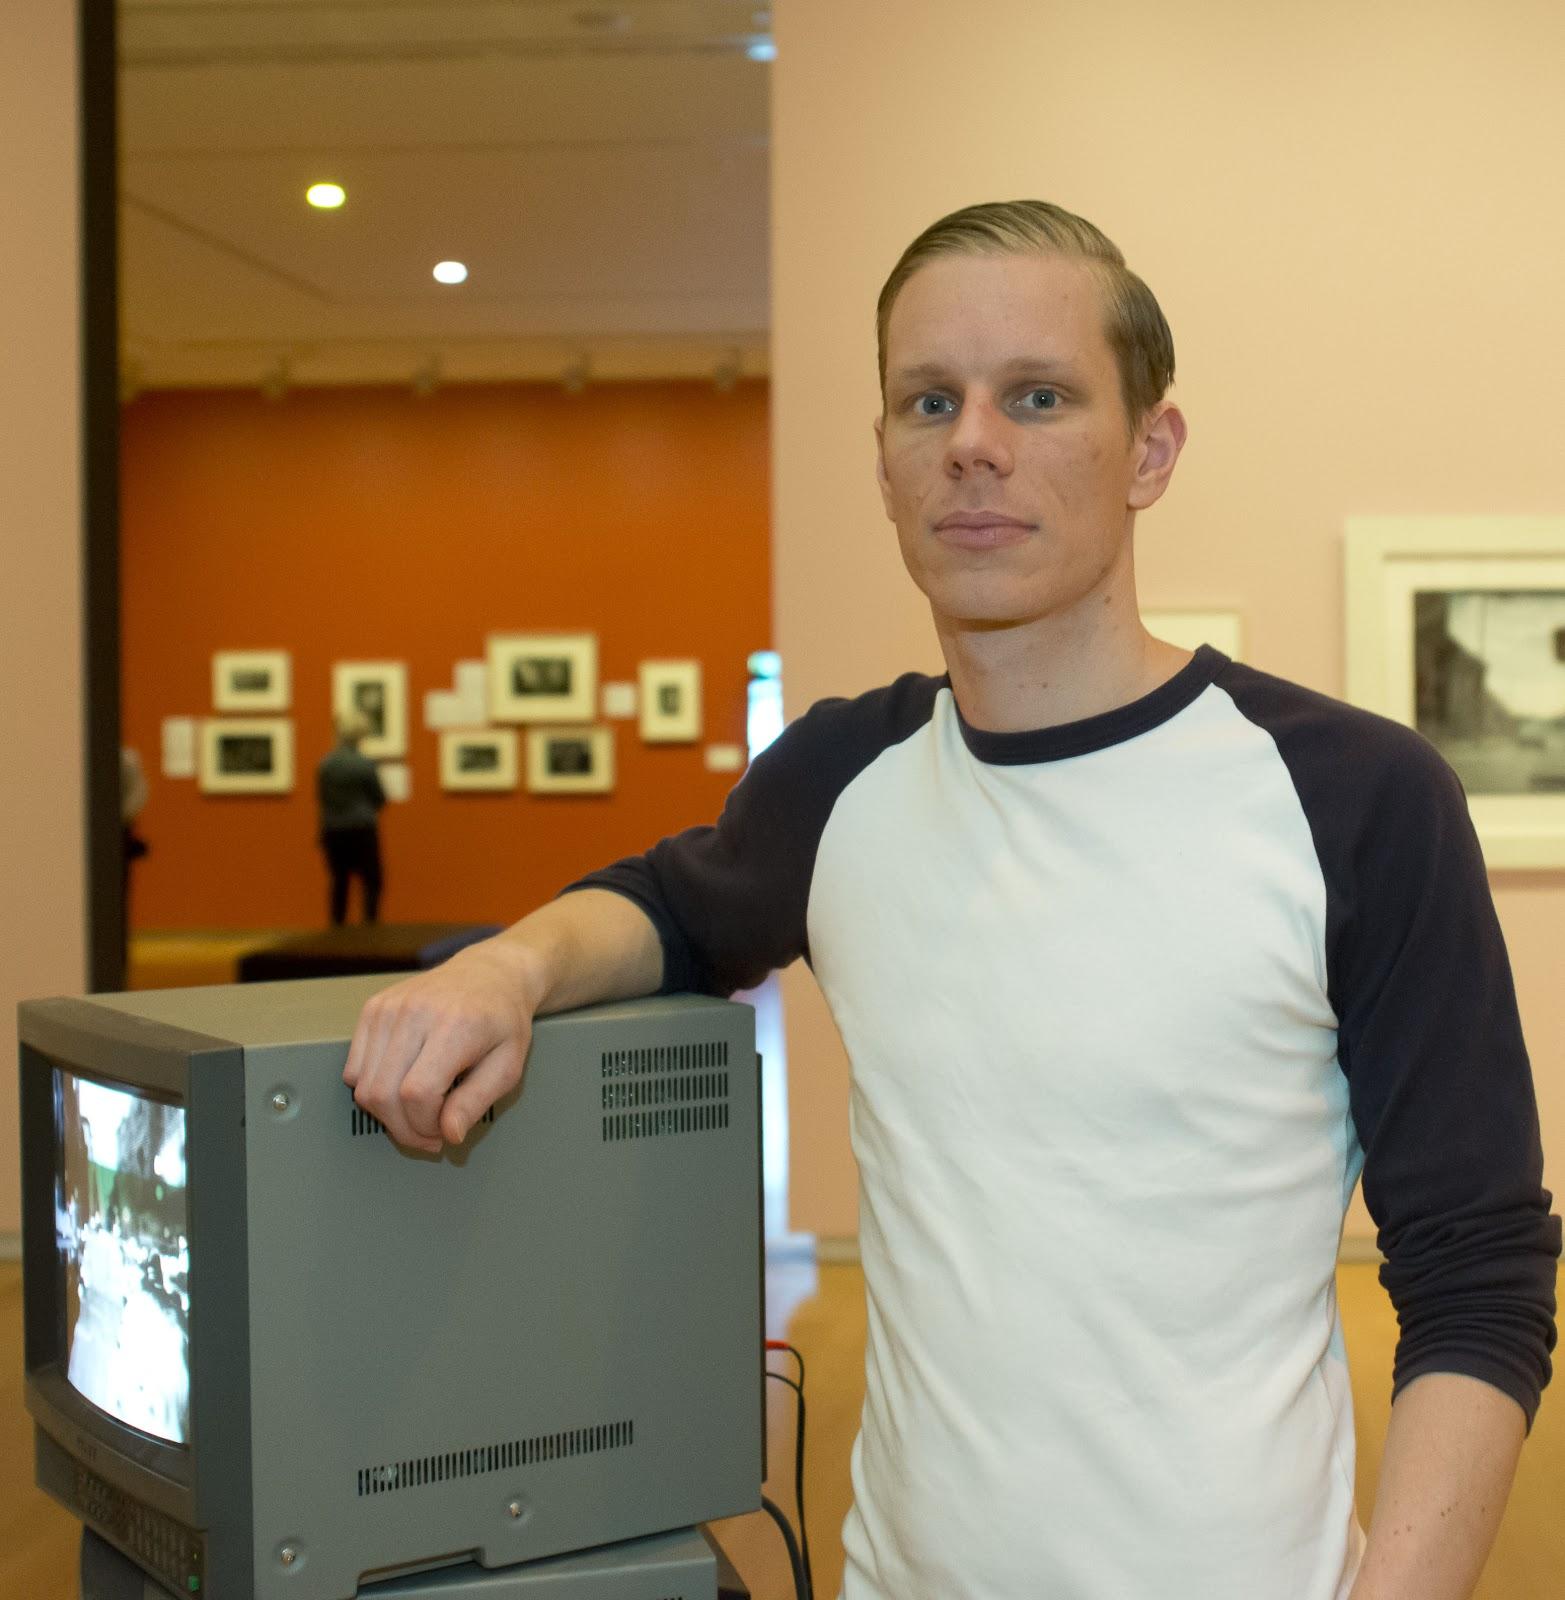 http://rfacdn.nz/artgallery/assets/media/blog-staff-spotlight-scott-everson.jpg